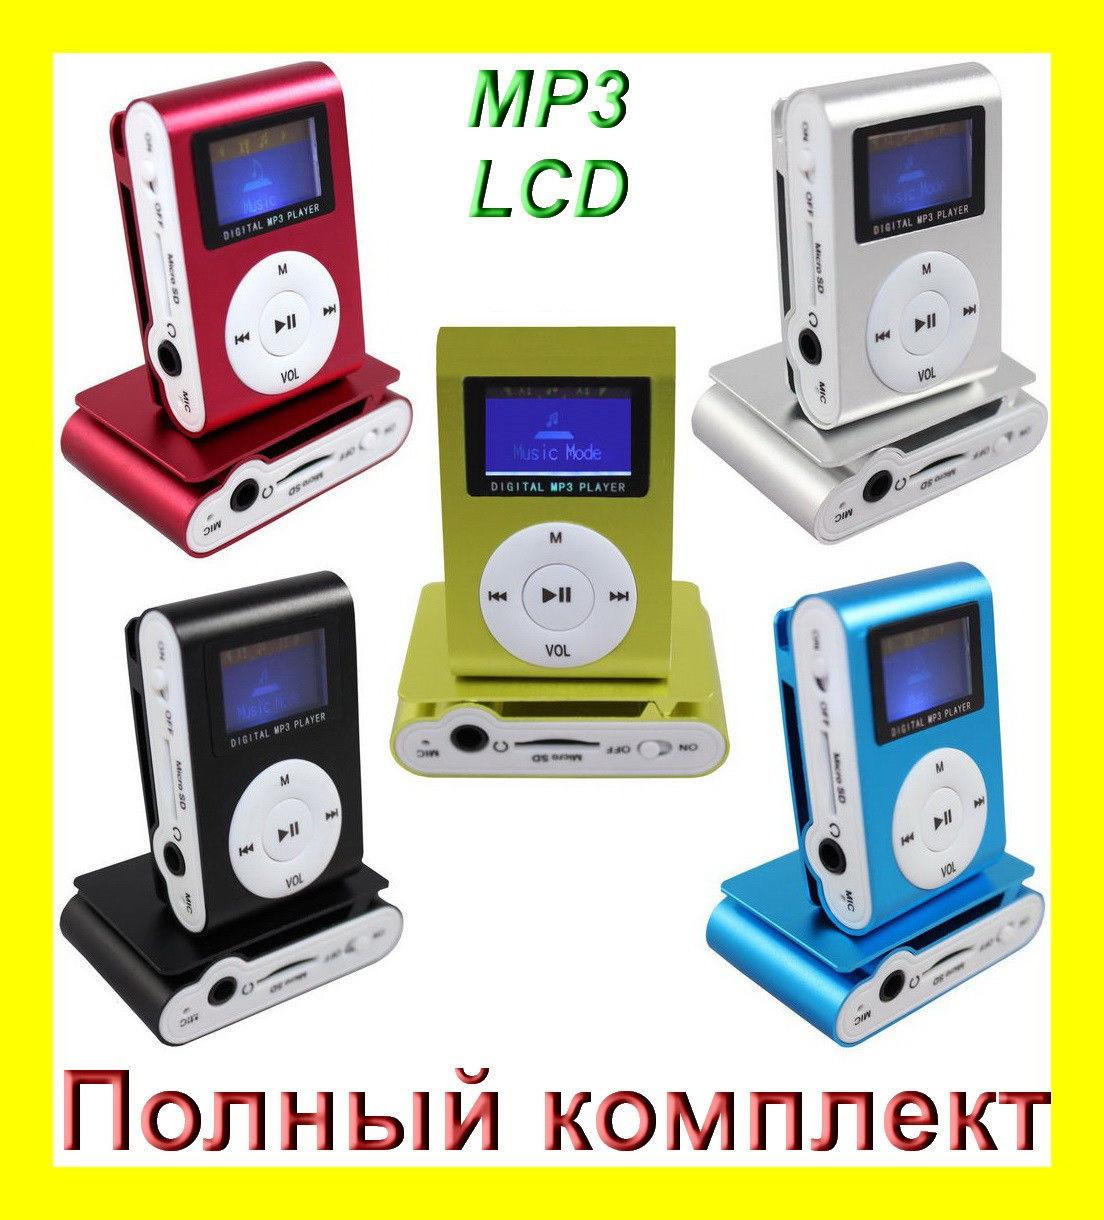 "MP3 с LCD, FM-радио USB, Наушники, Коробка!Опт - Магазин ""Налетай-ка"" в Одессе"